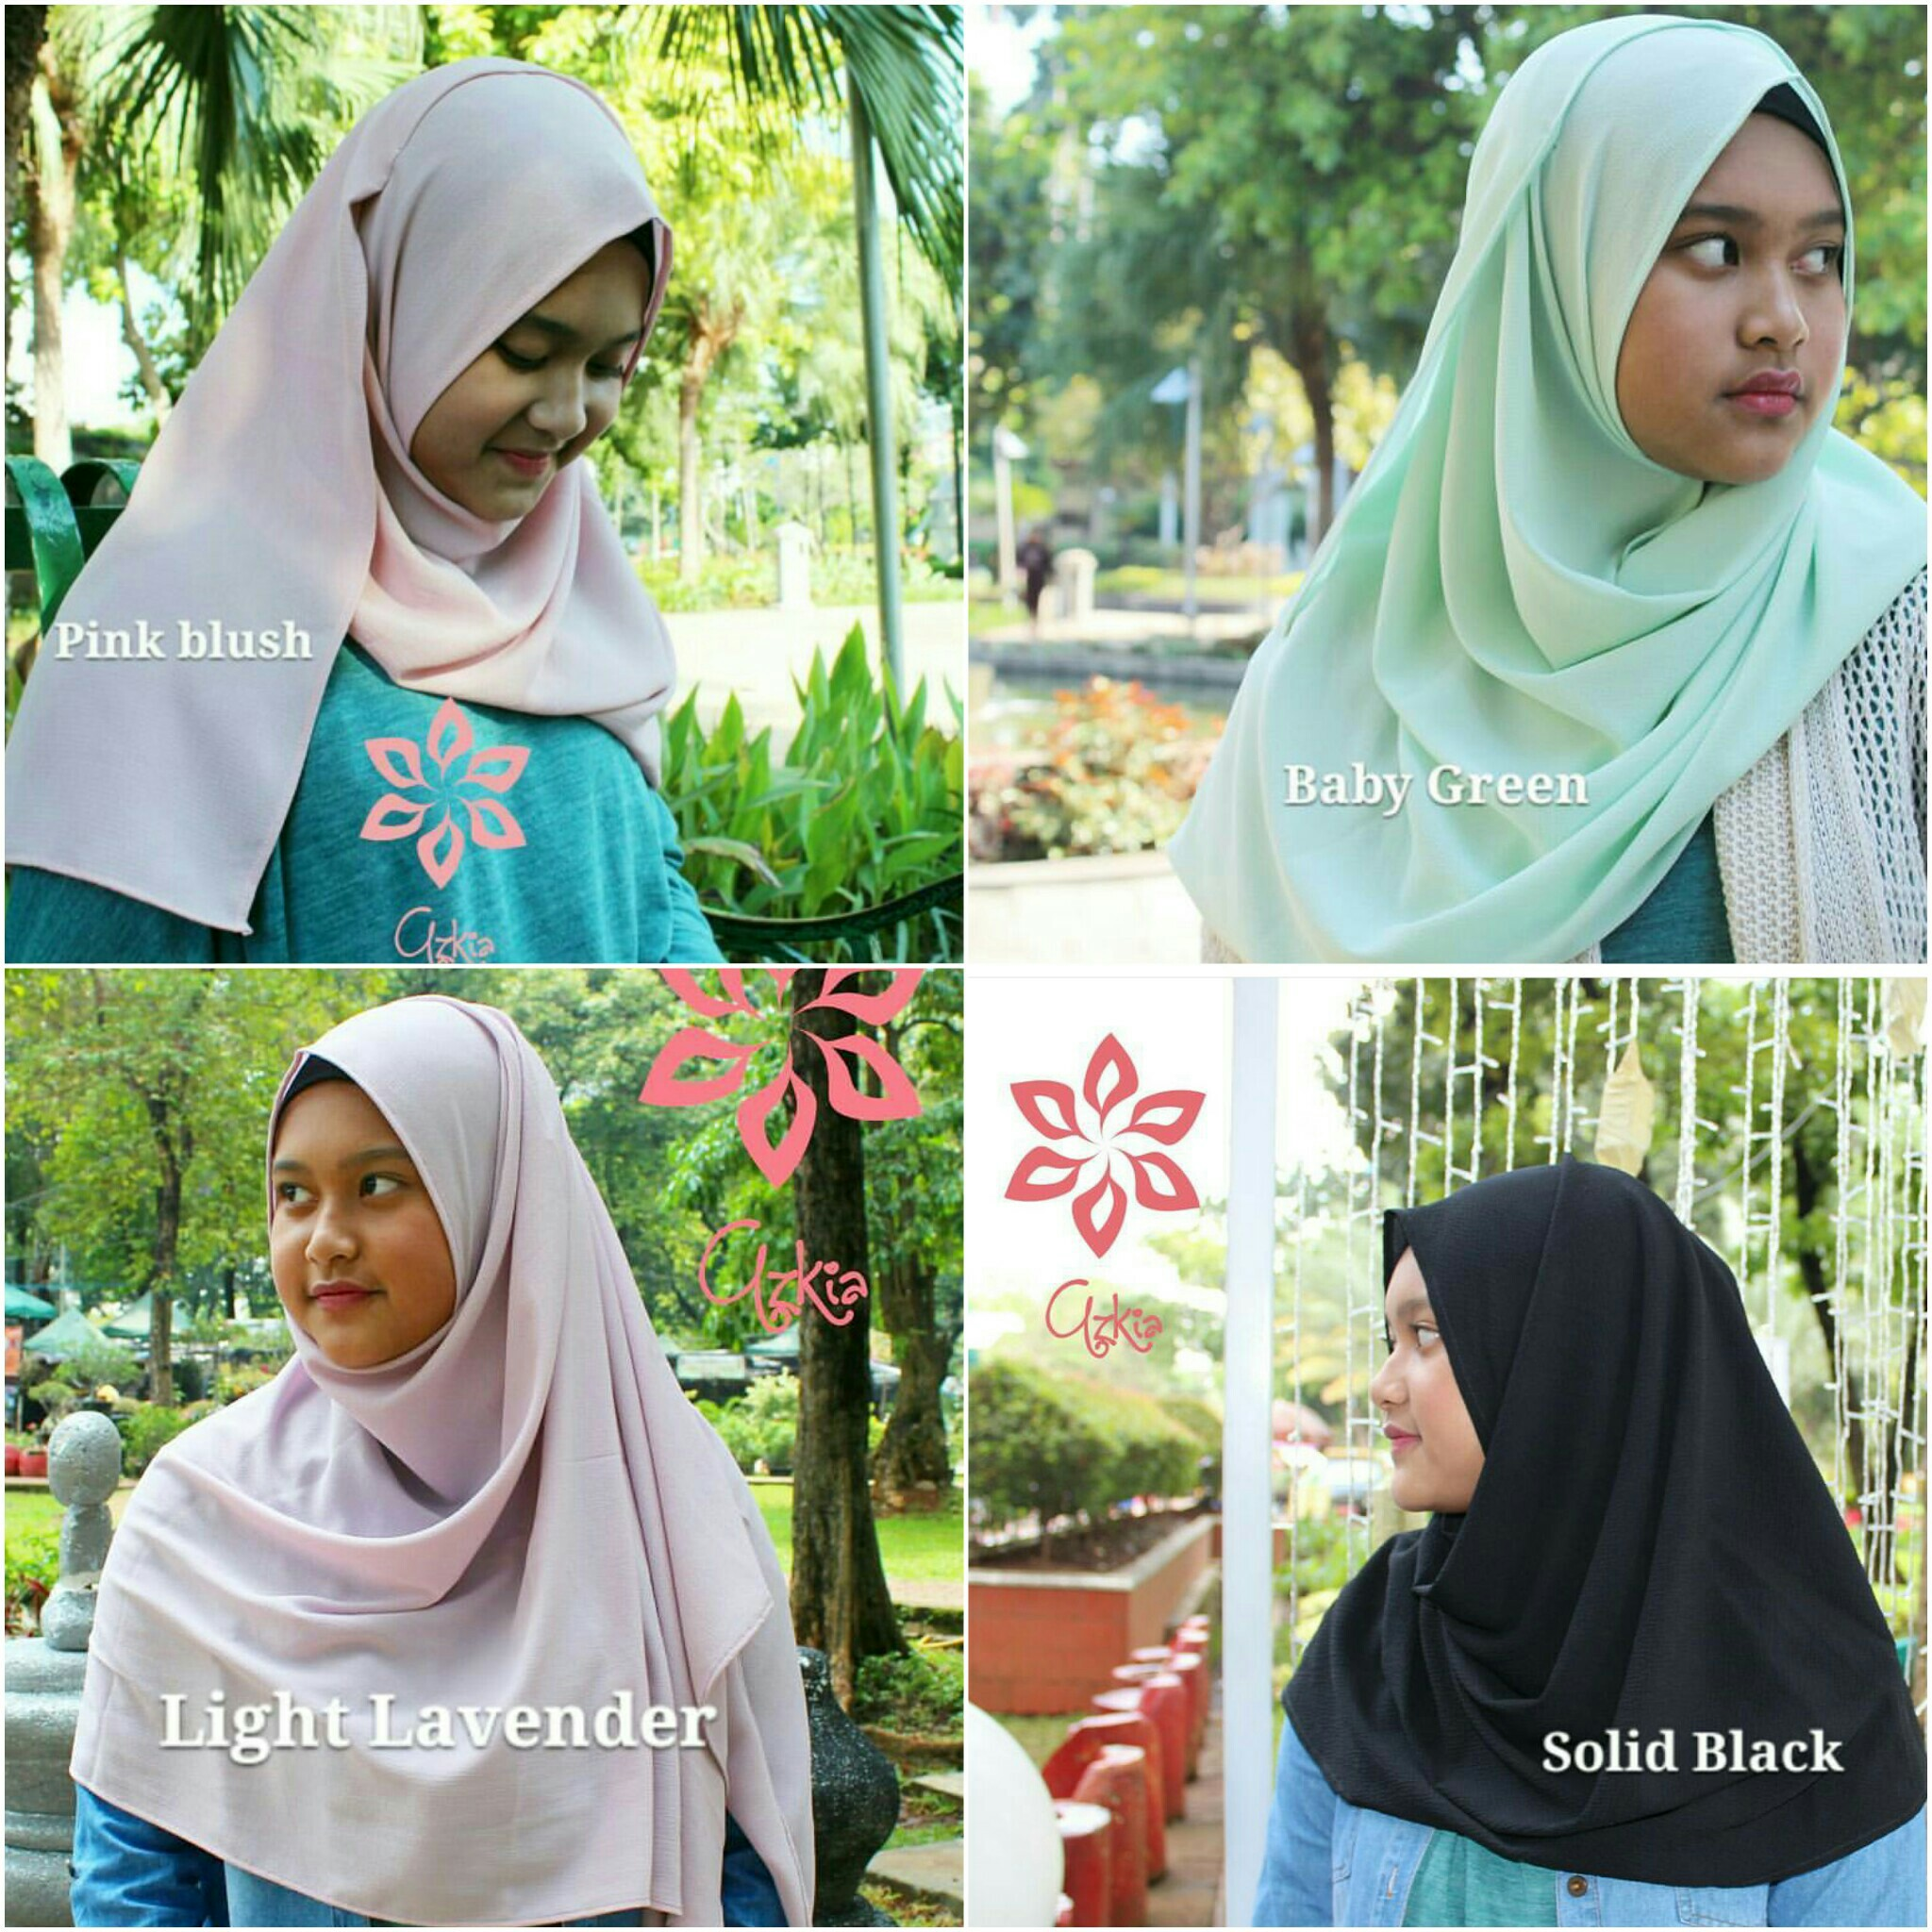 Jilbab Instan / Hijab Instan / Pashmina Instan Azkia